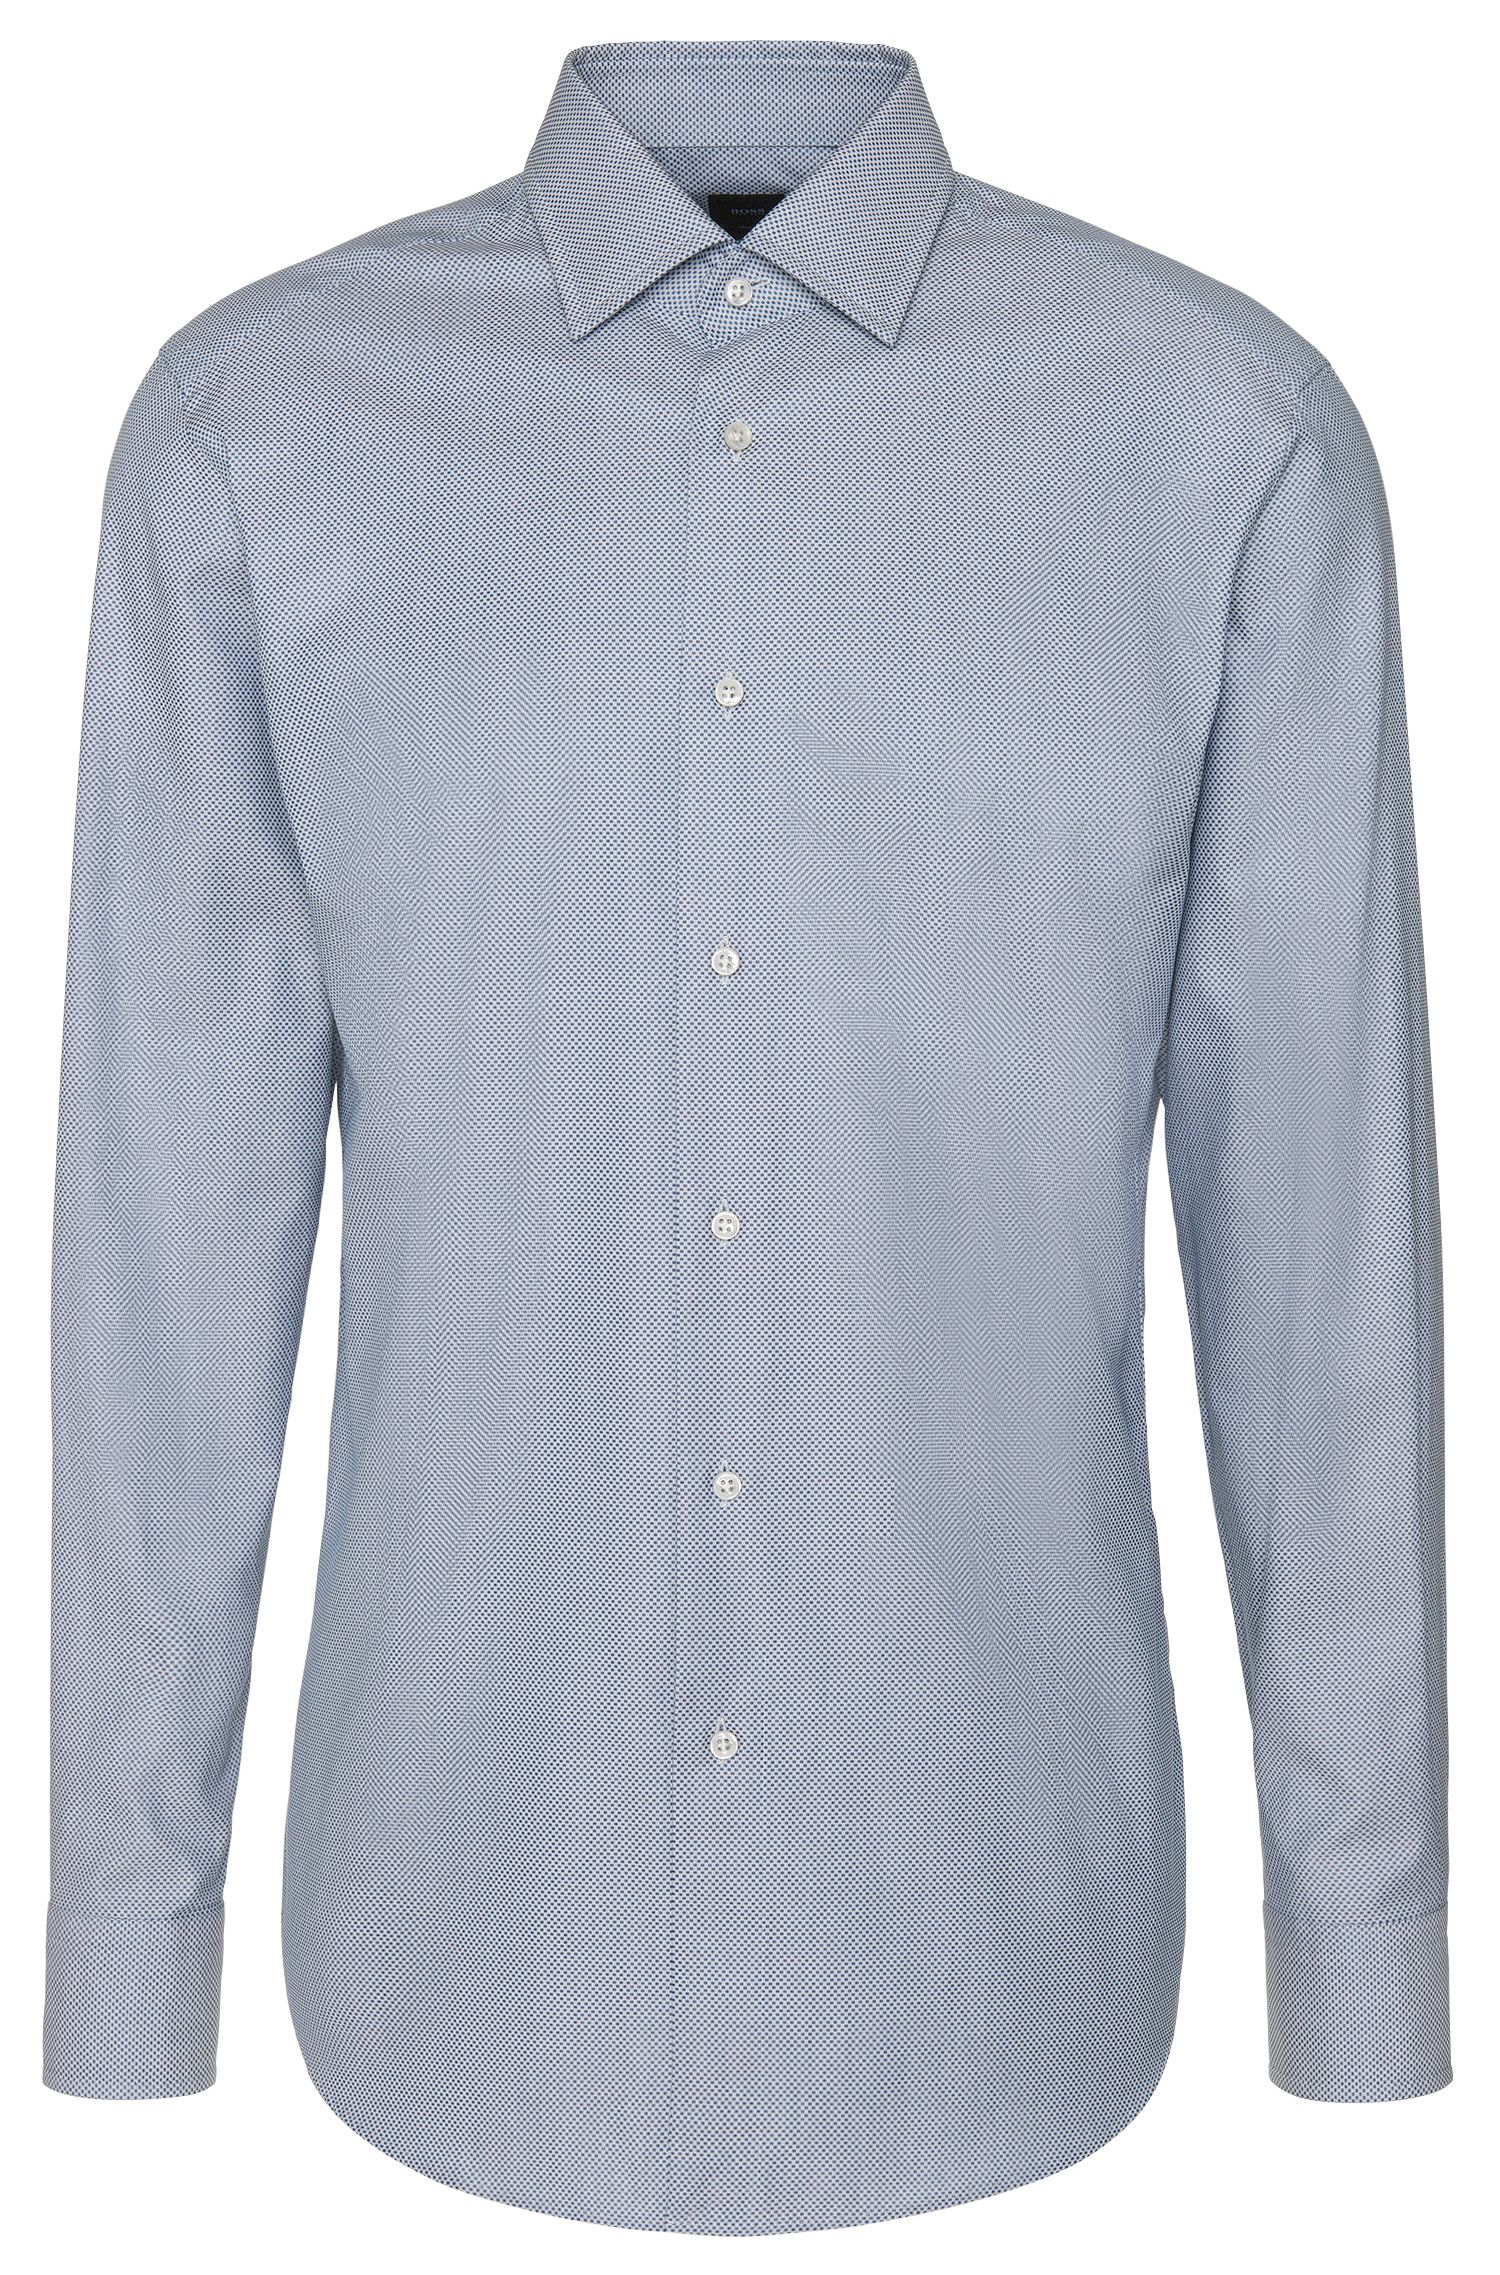 Fein gemustertes Regular-Fit Tailored Hemd aus Baumwolle: 'T-Stuart'